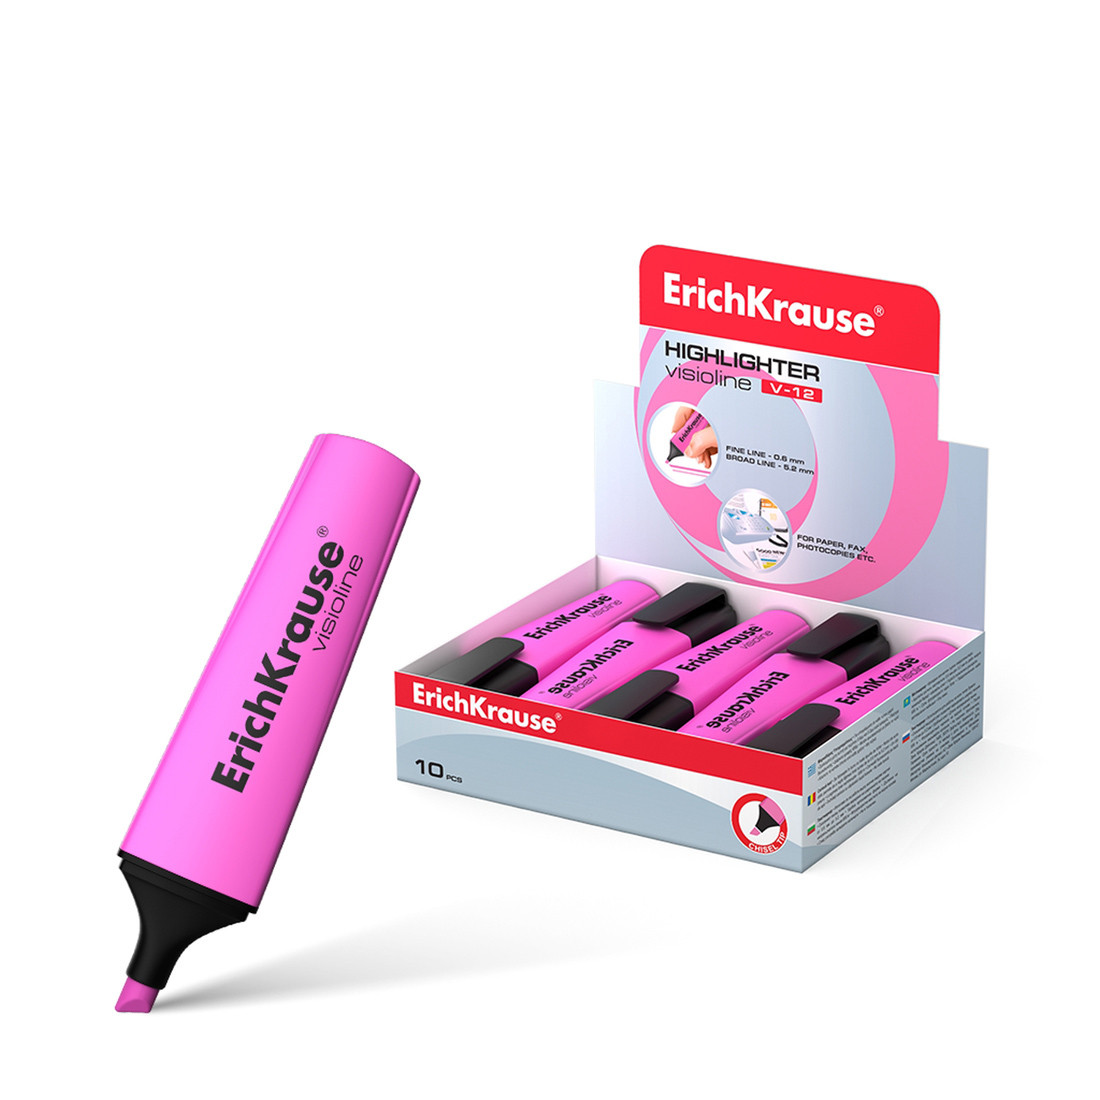 Текстмаркер ErichKrause® 32498 Visioline V-12 цвет чернил розовый